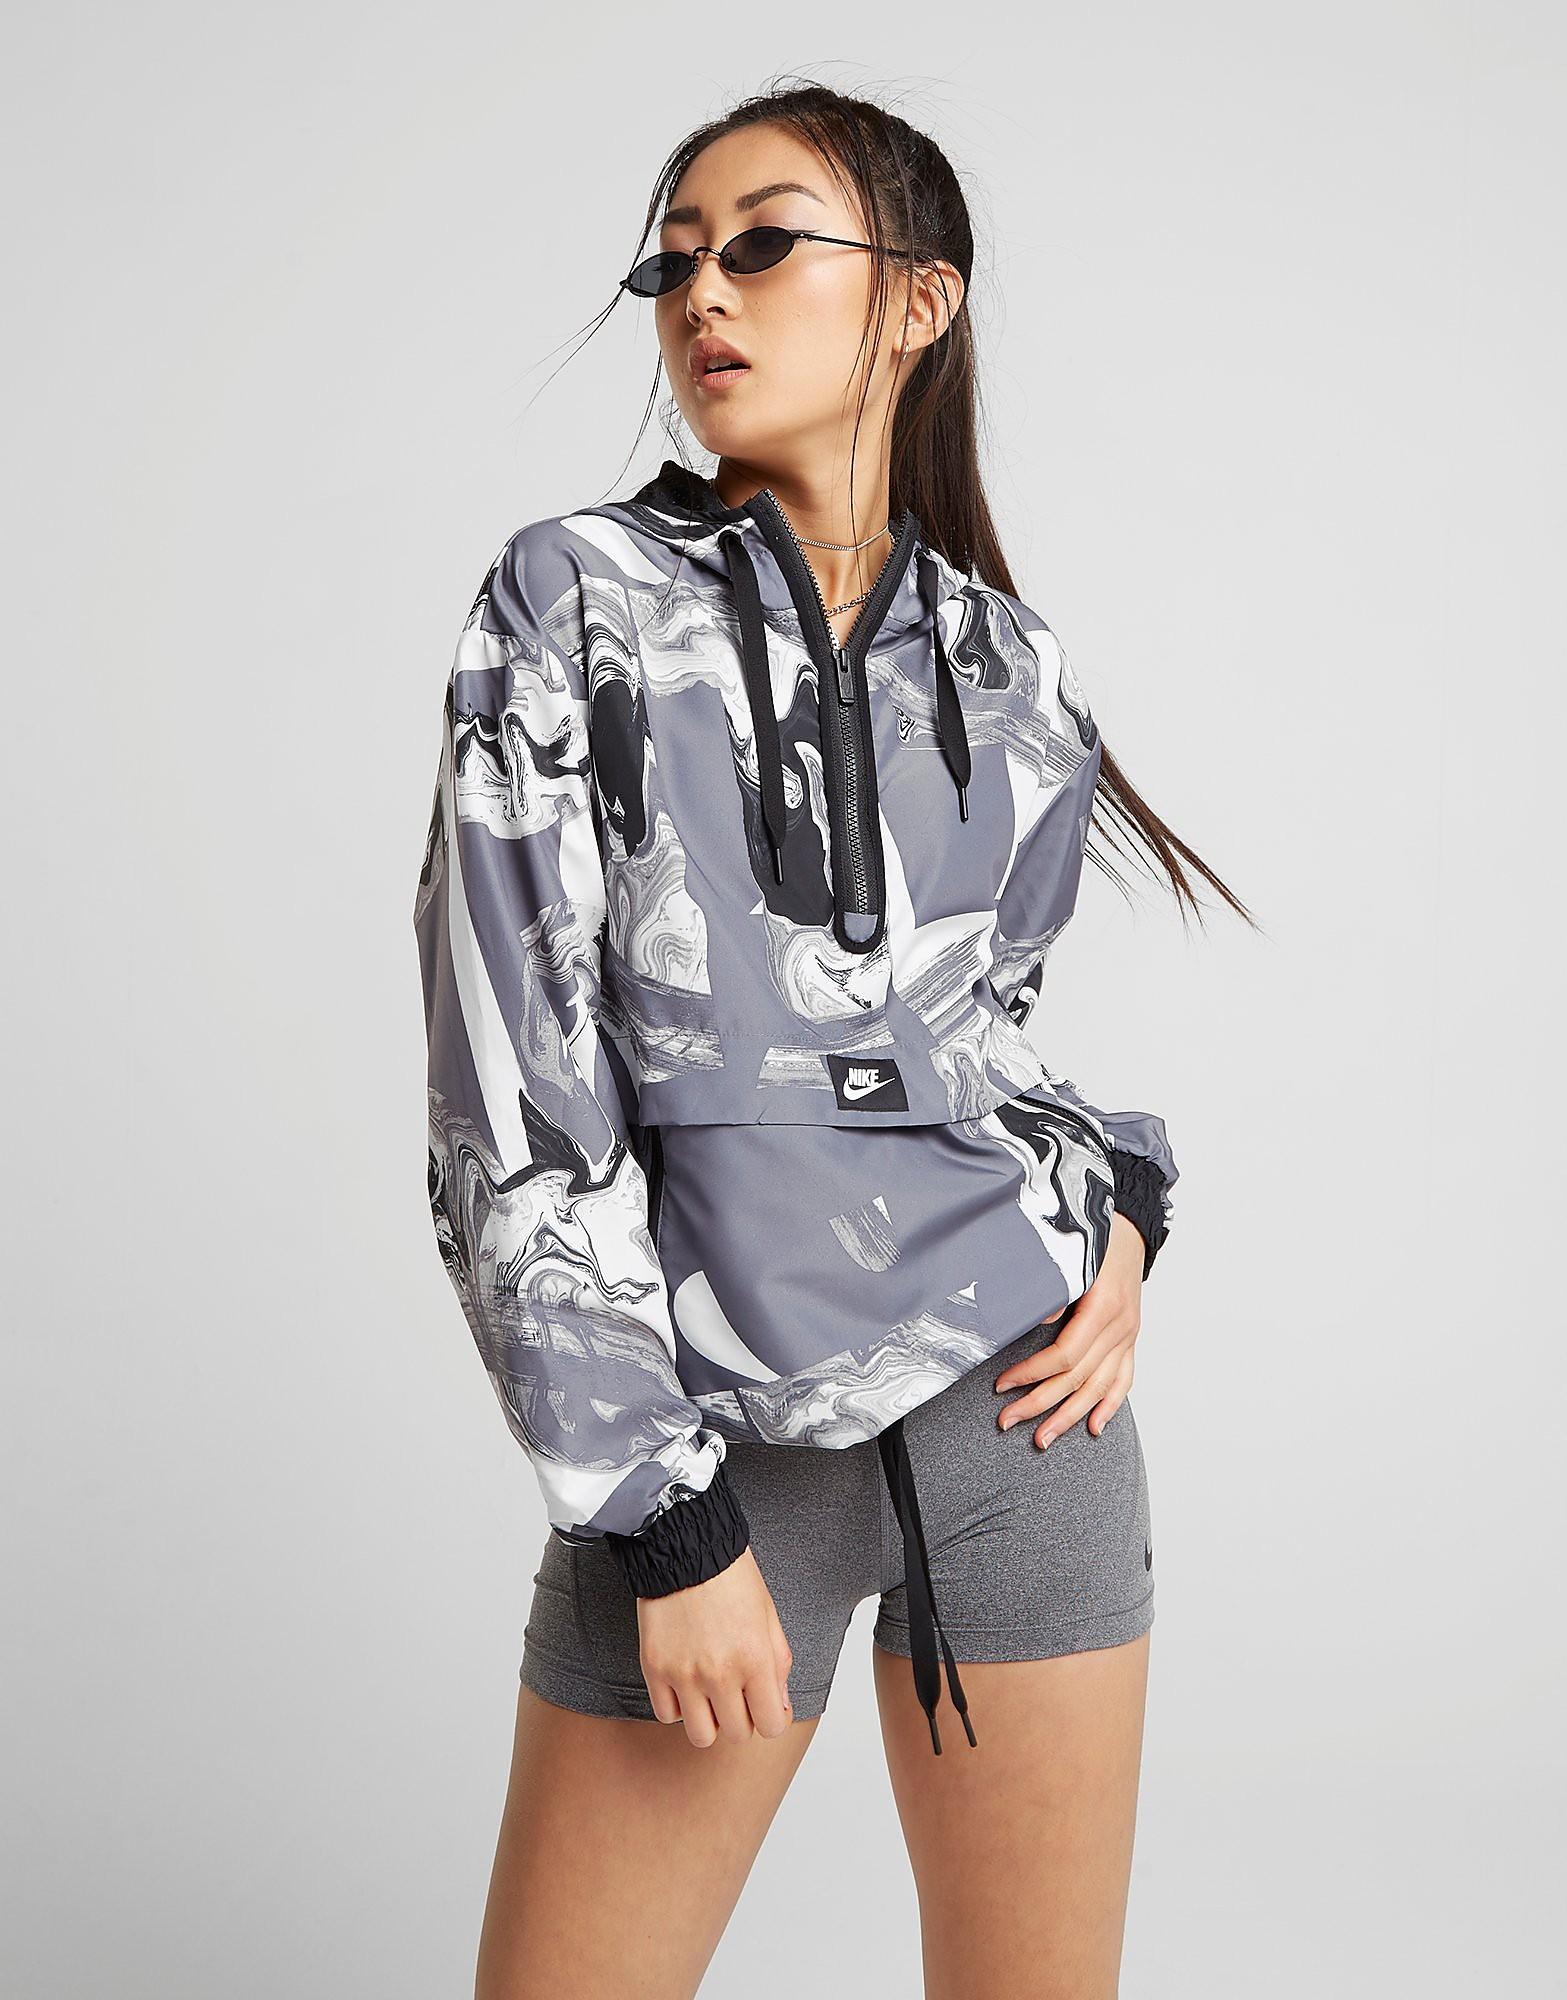 Nike Marble All Over Print Overhead Jacket